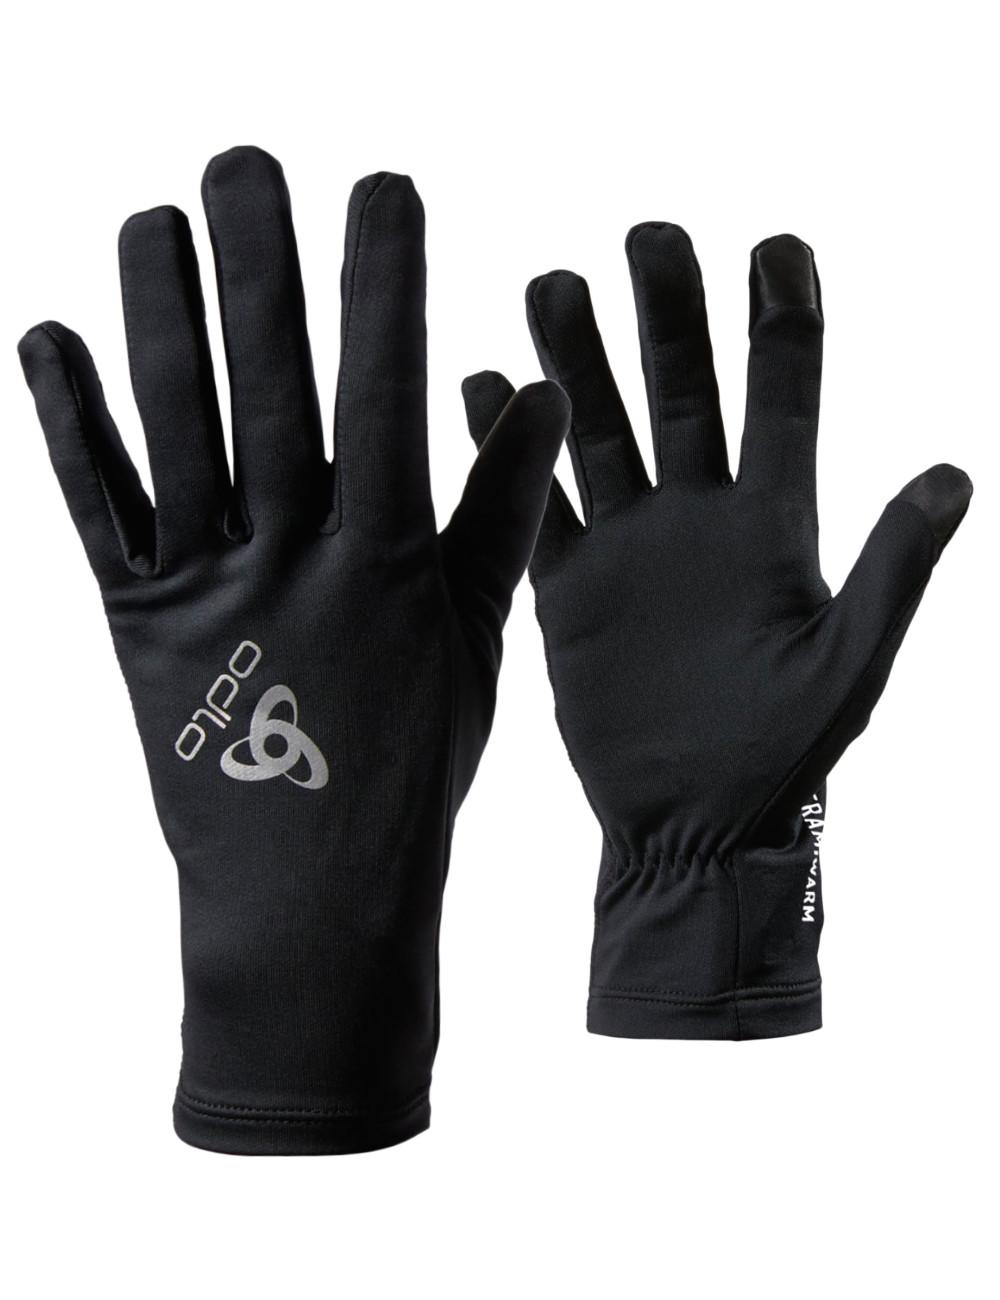 Rękawice ODLO CERAMIWARM LIGHT Running Gloves